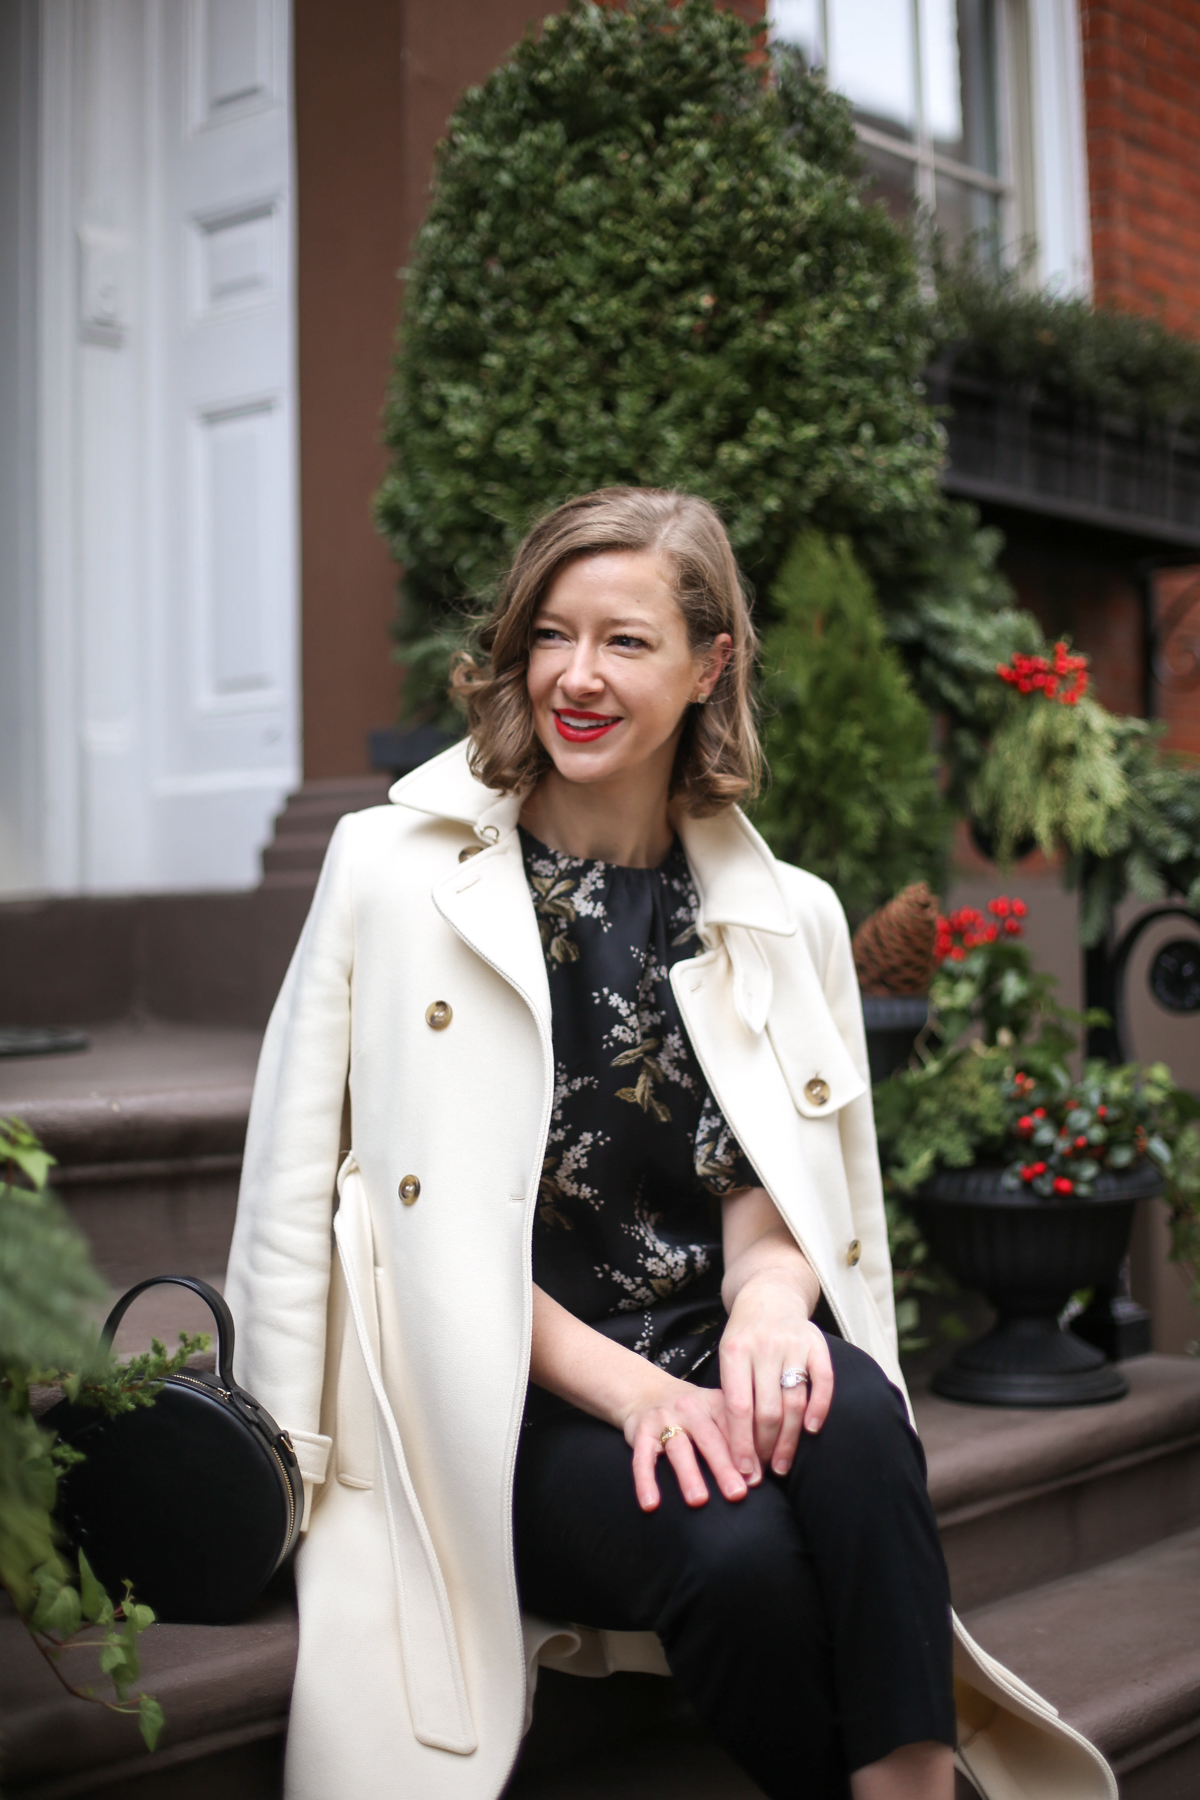 Stacie Flinner x Charlotte Brody Holiday Blouses-5.jpg